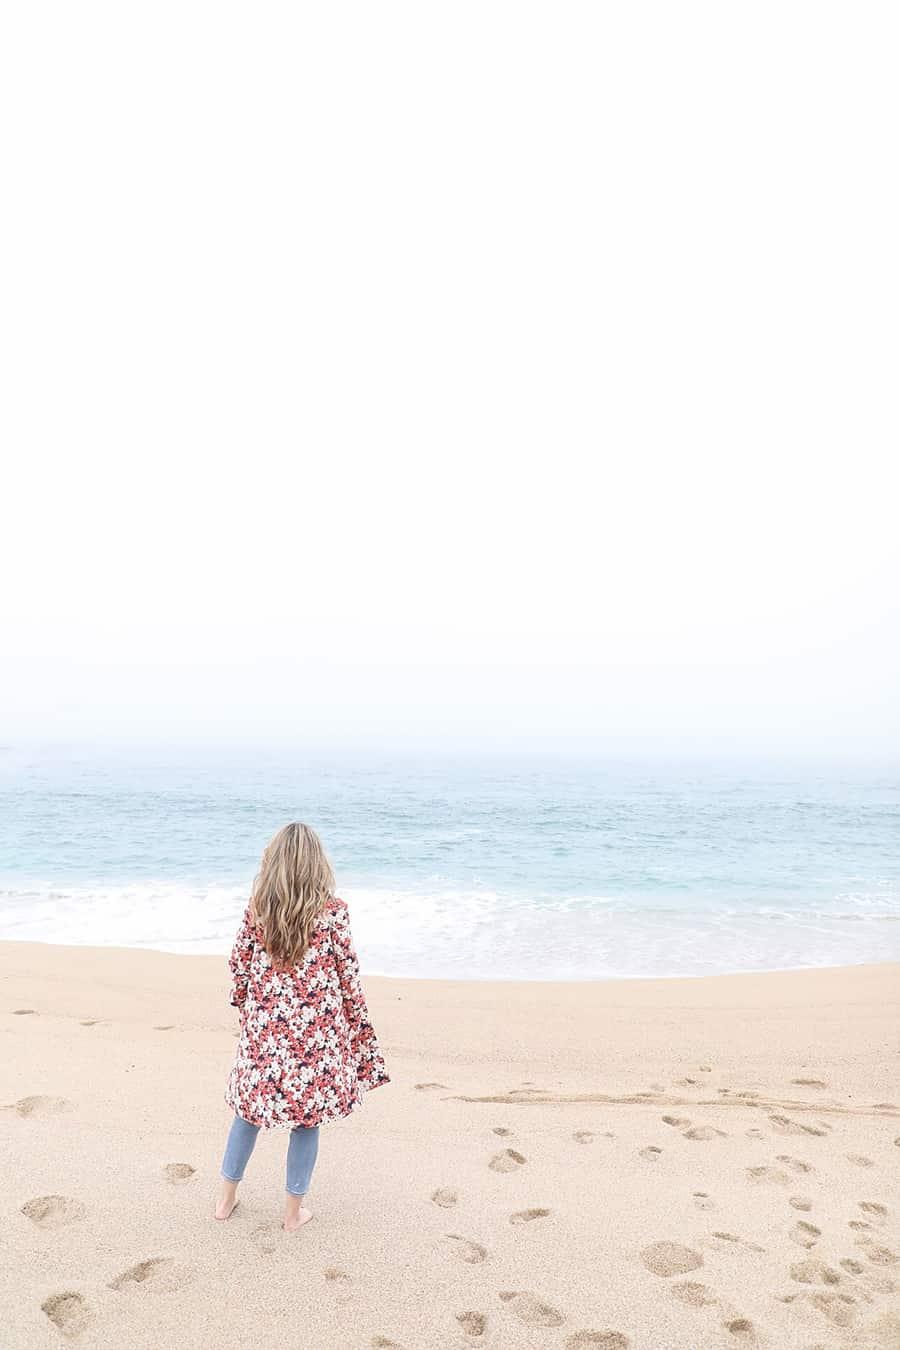 Eden Passante on the beach in Carmel